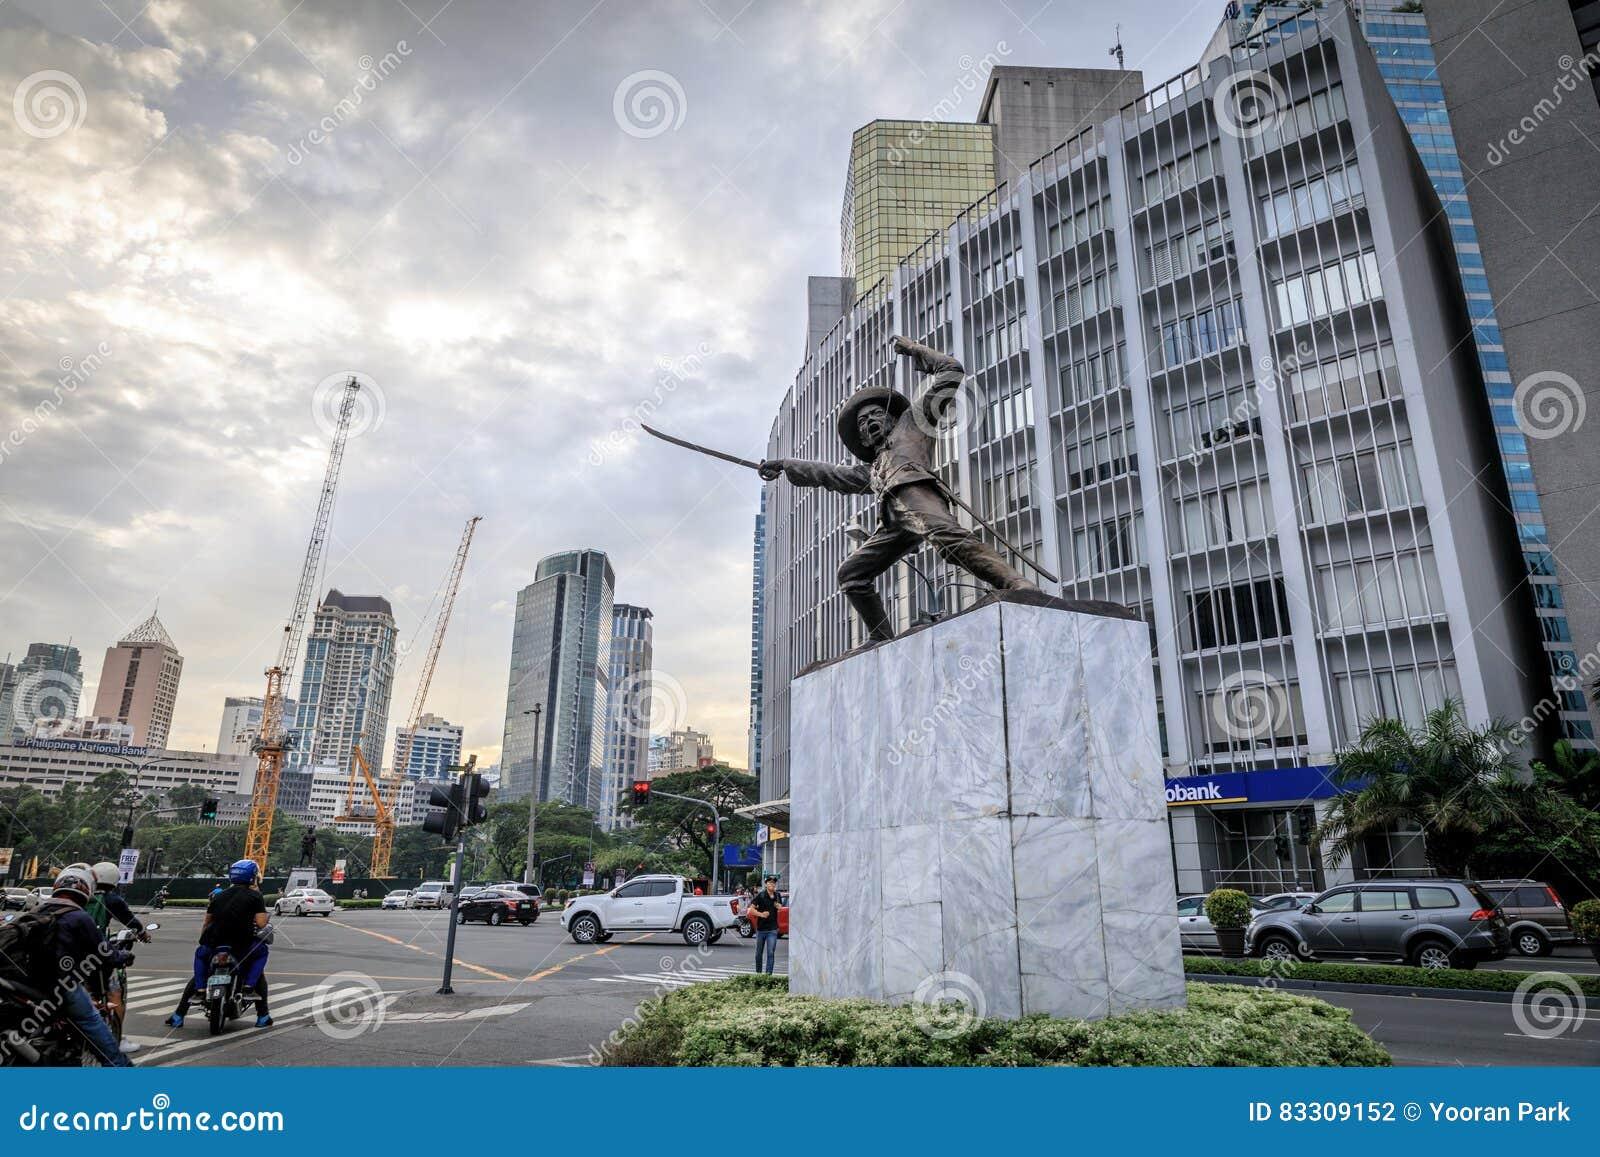 General Pio马卡蒂的Ave台尔Pilar雕象